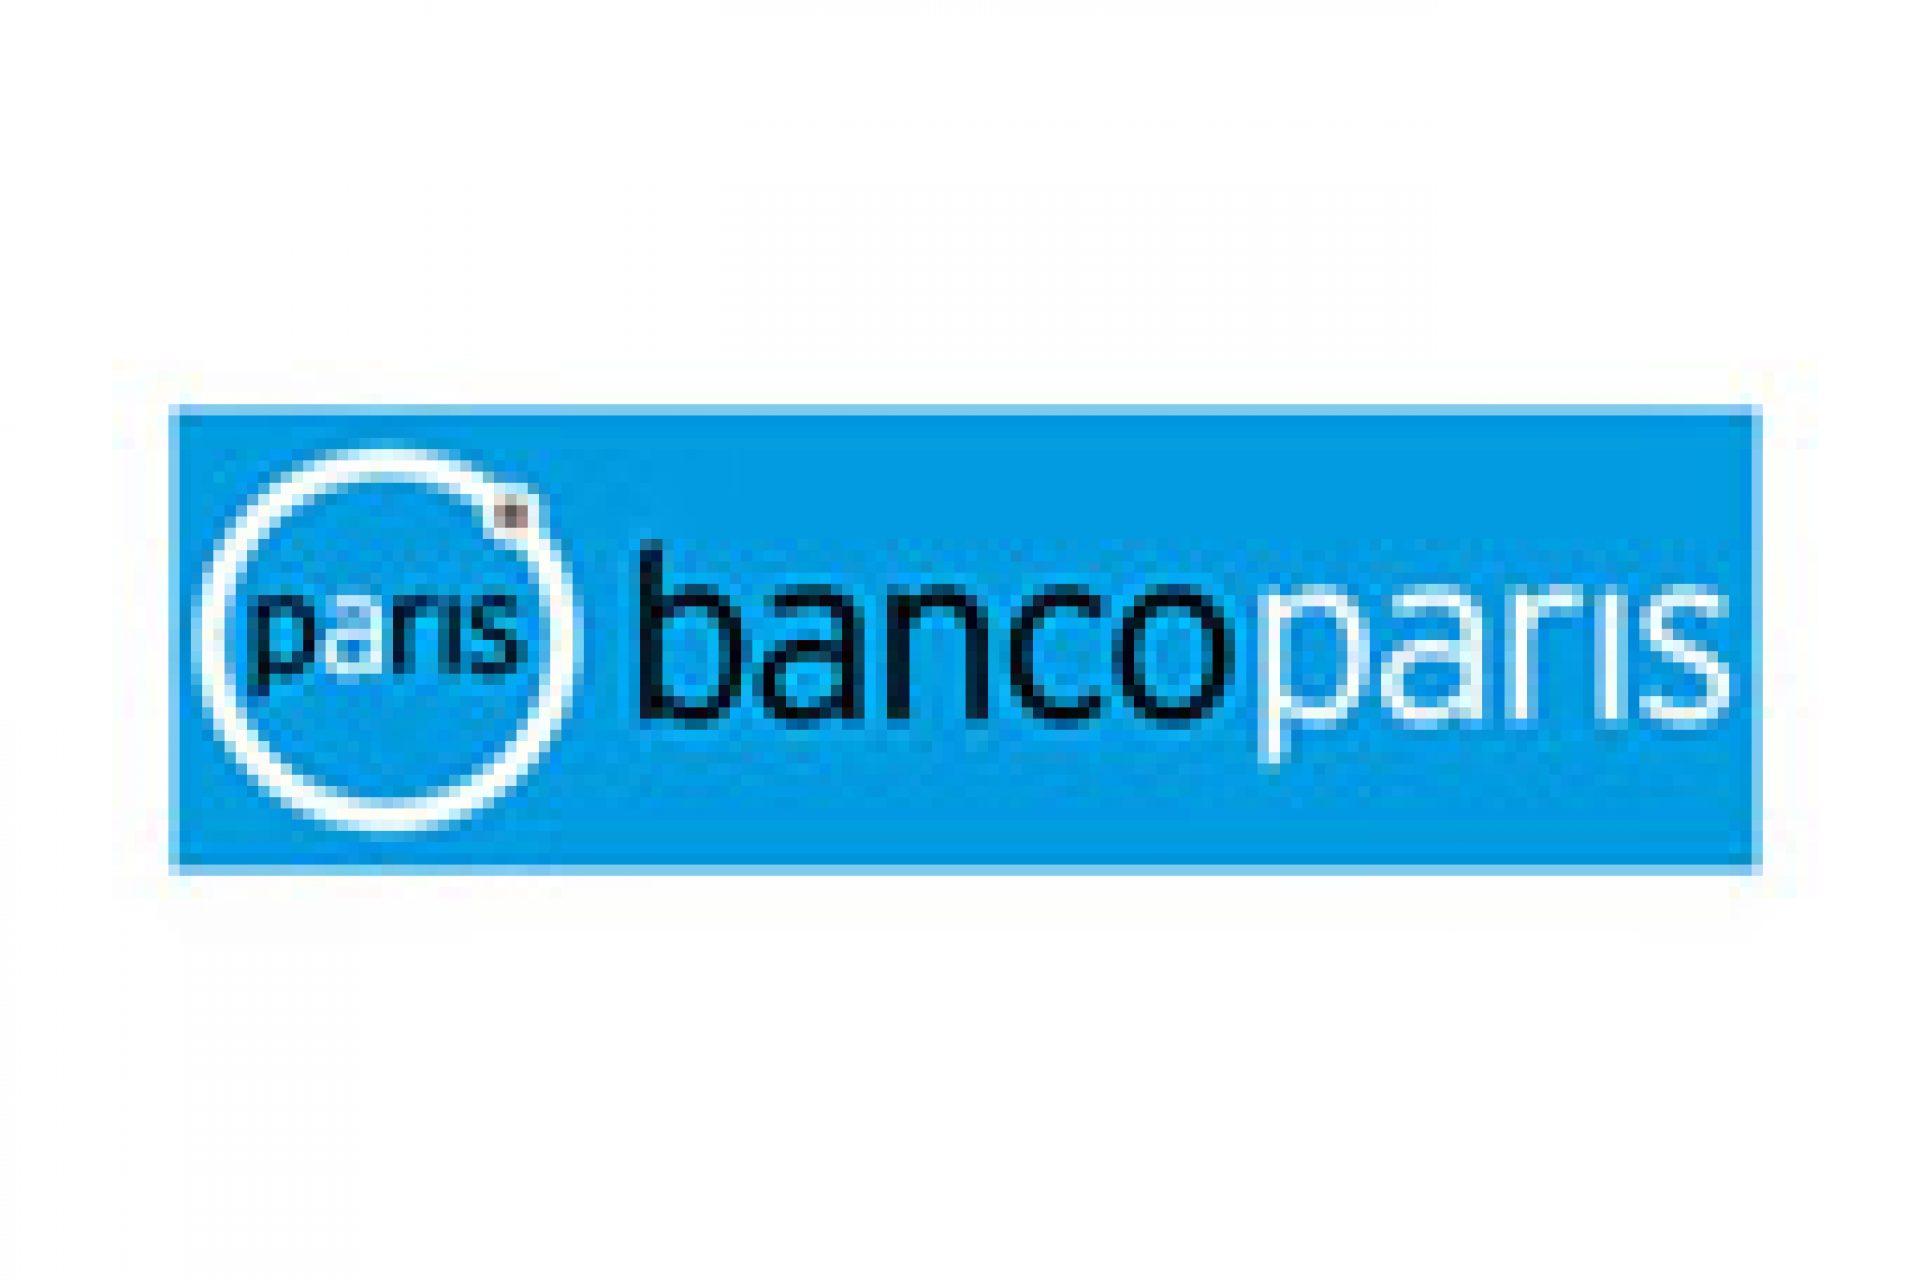 Banco Paris